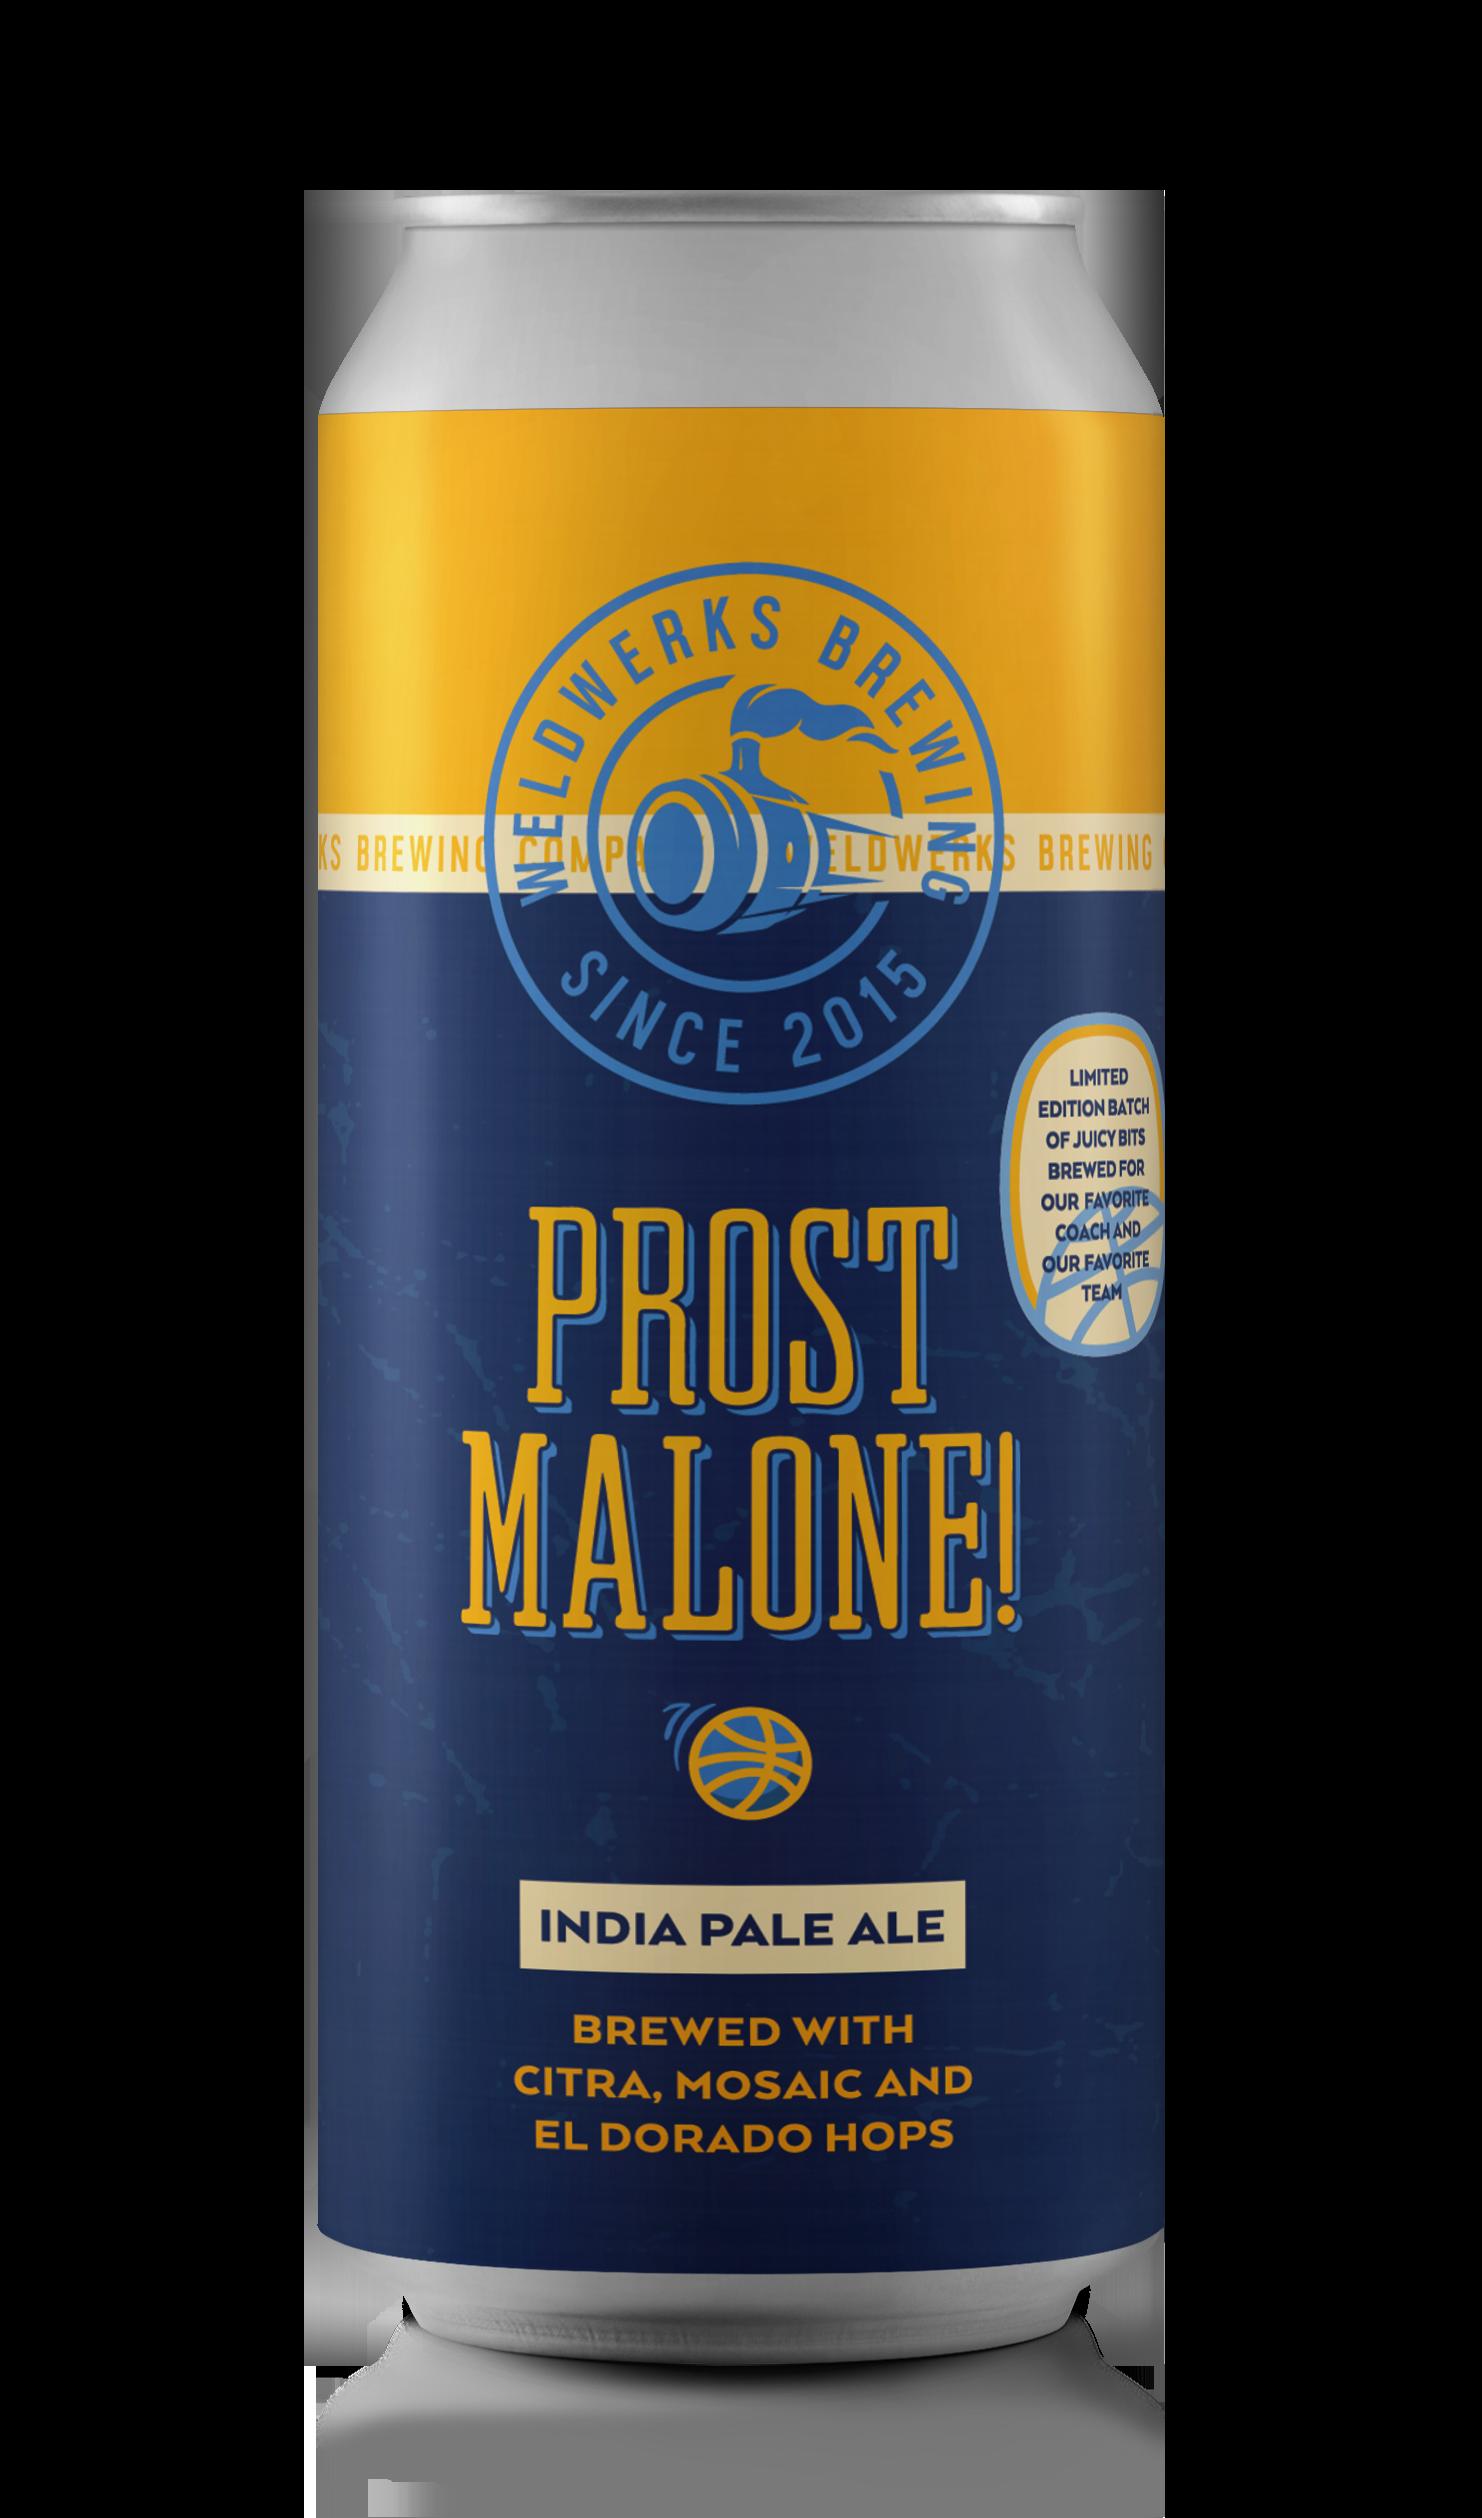 Prost Malone!